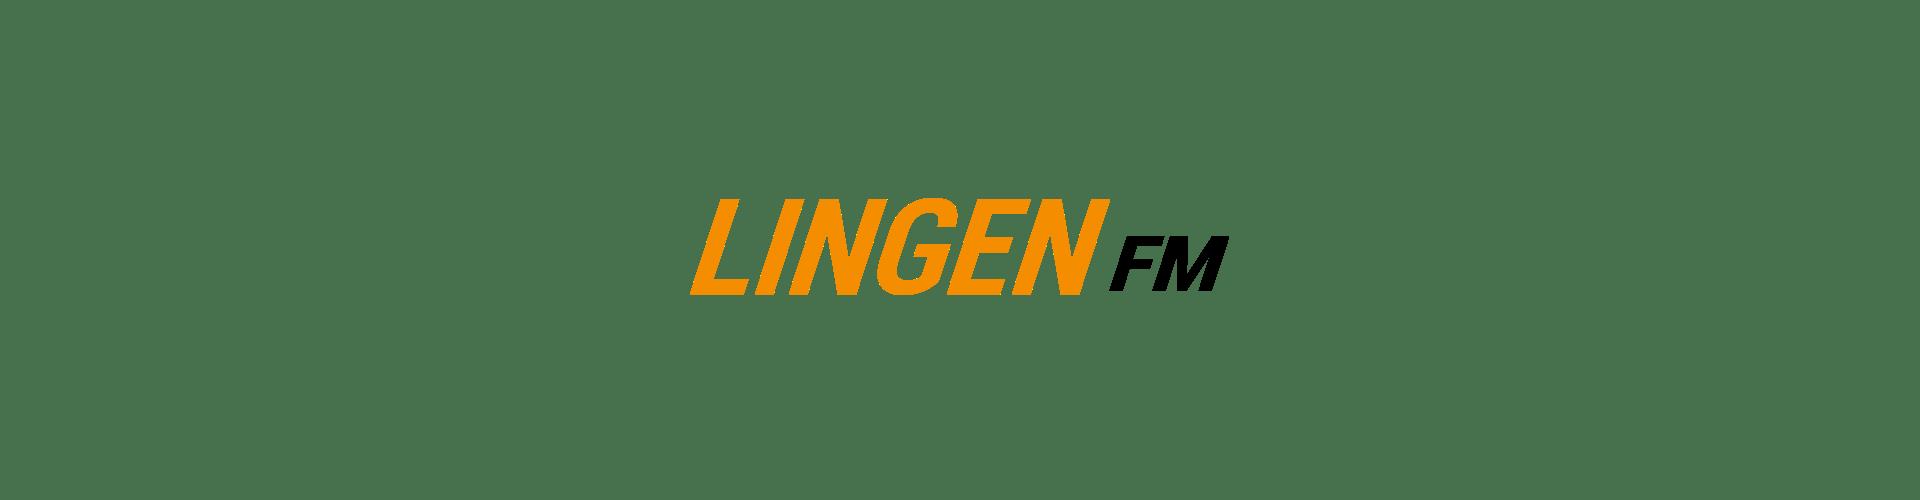 Lingen FM